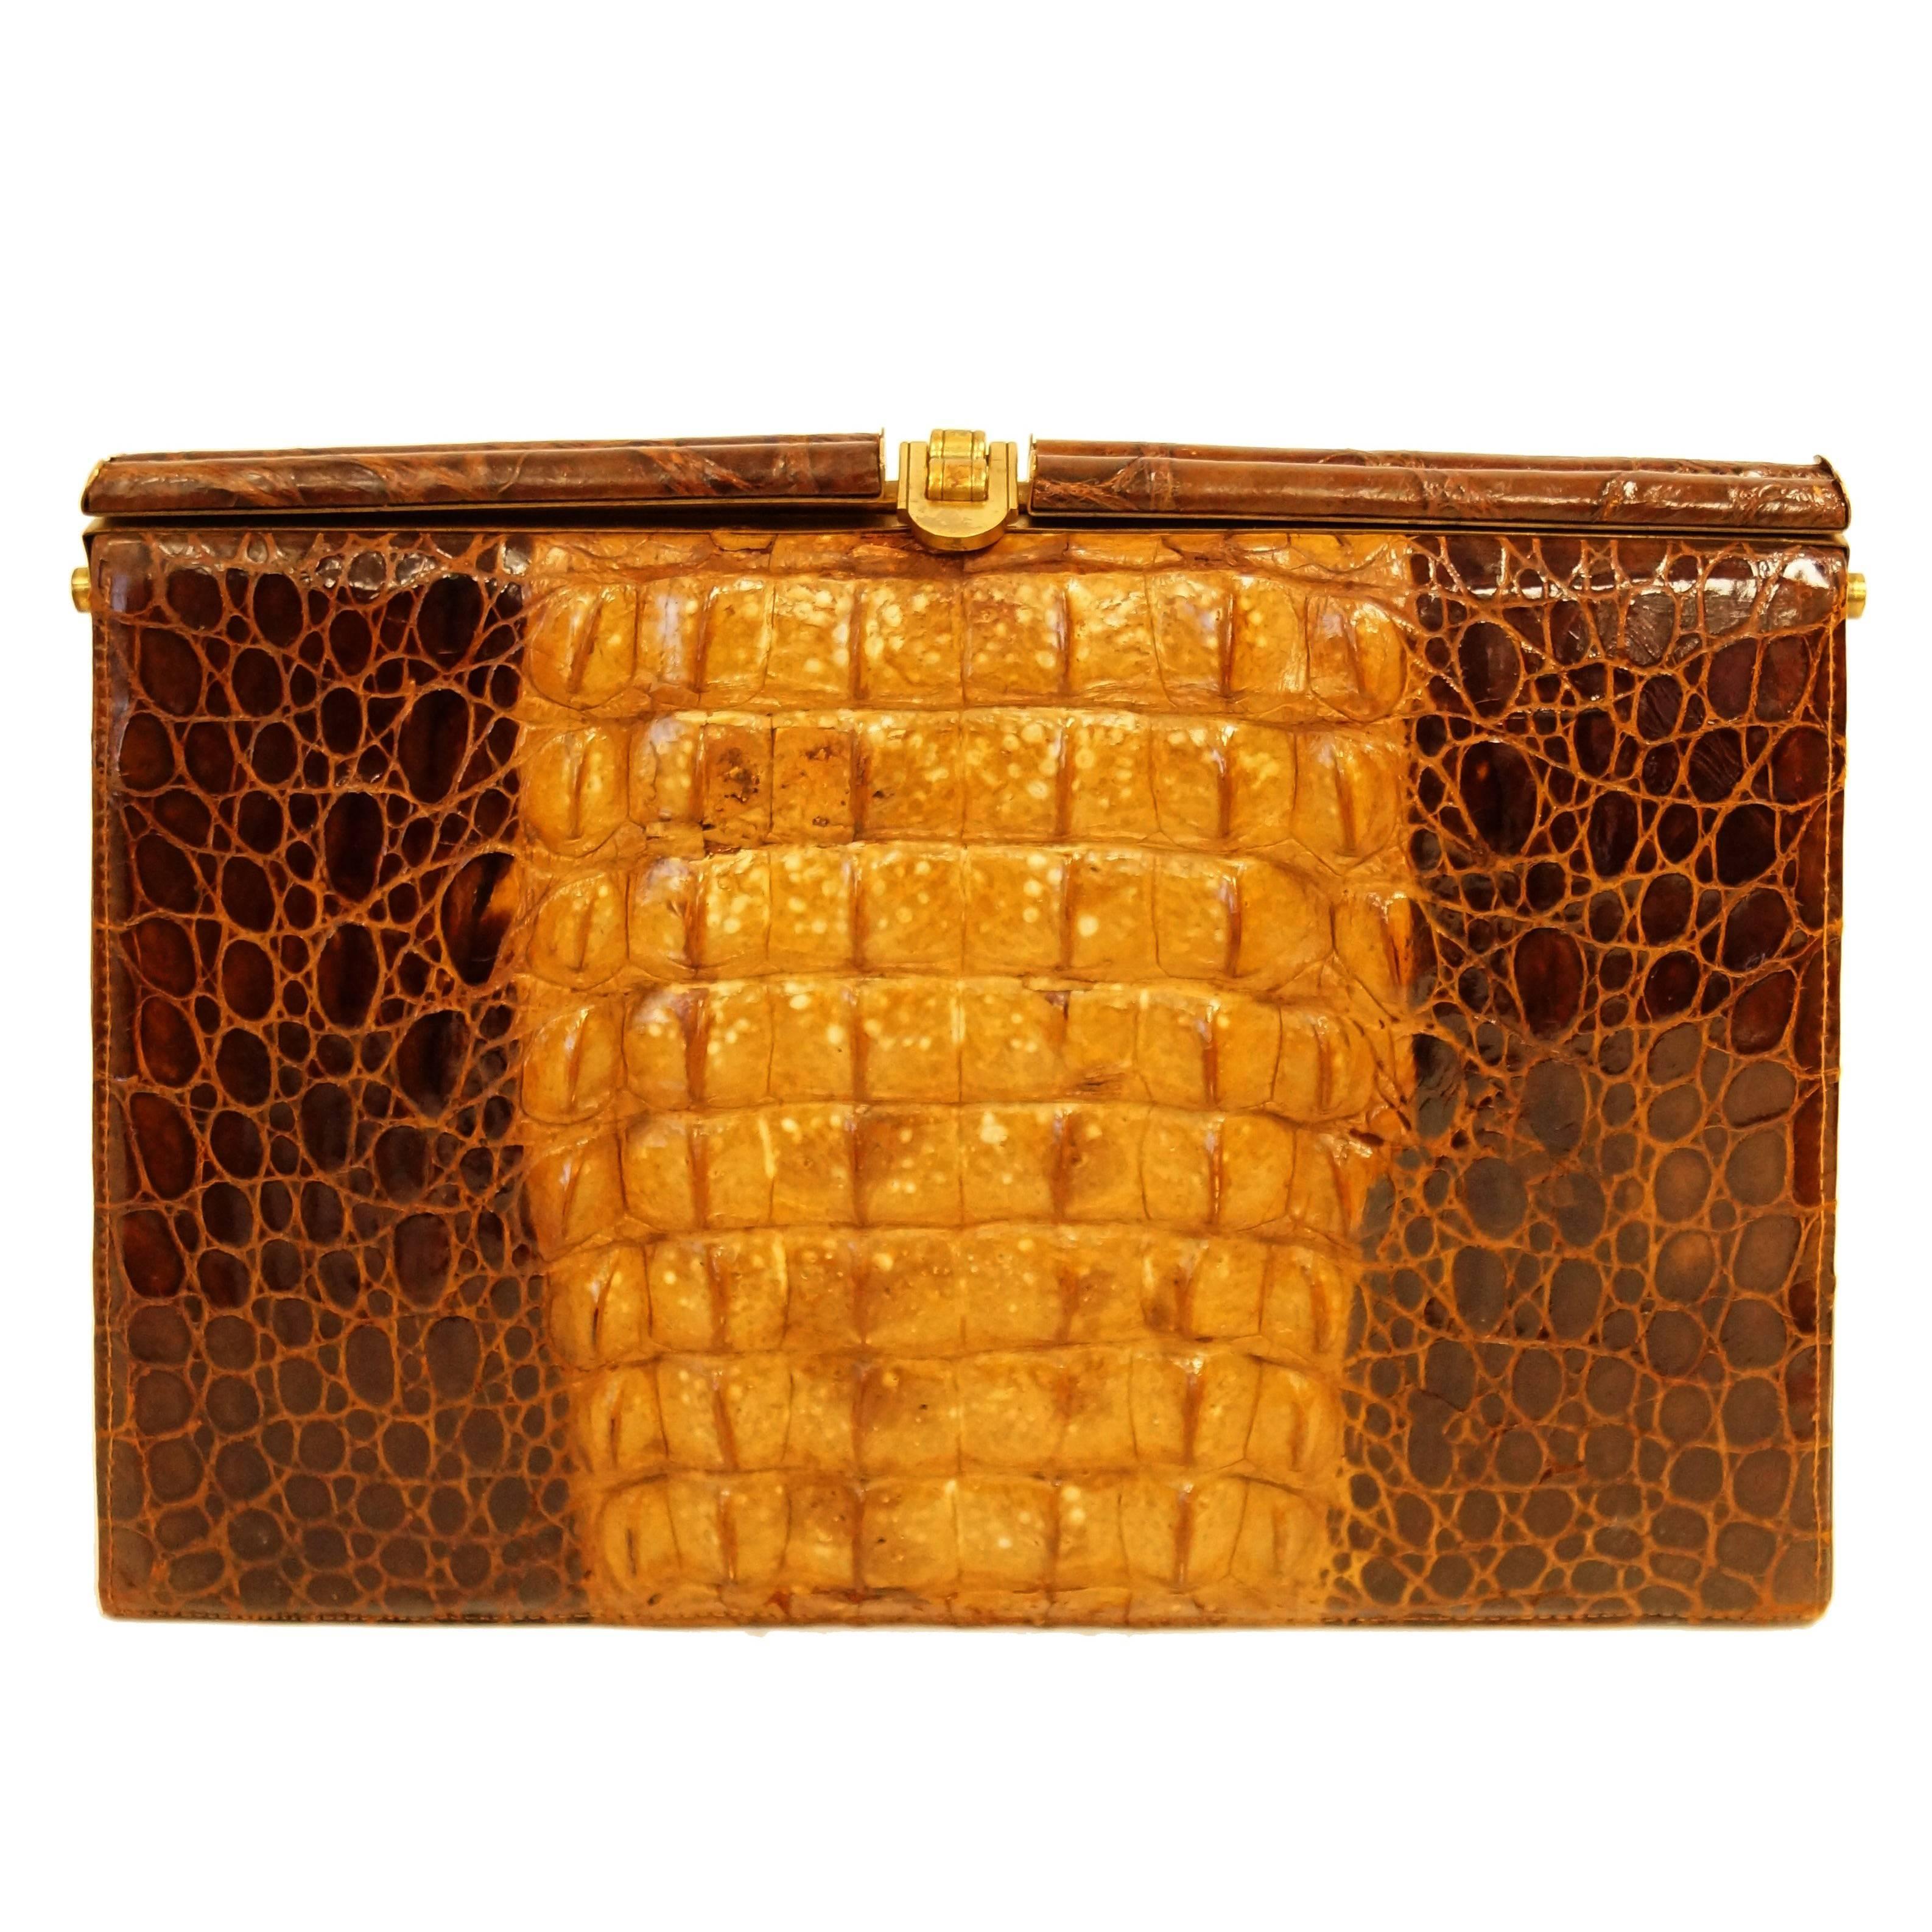 1stdibs Argentinian Alligator Clutch Handbag UA9Fixxr